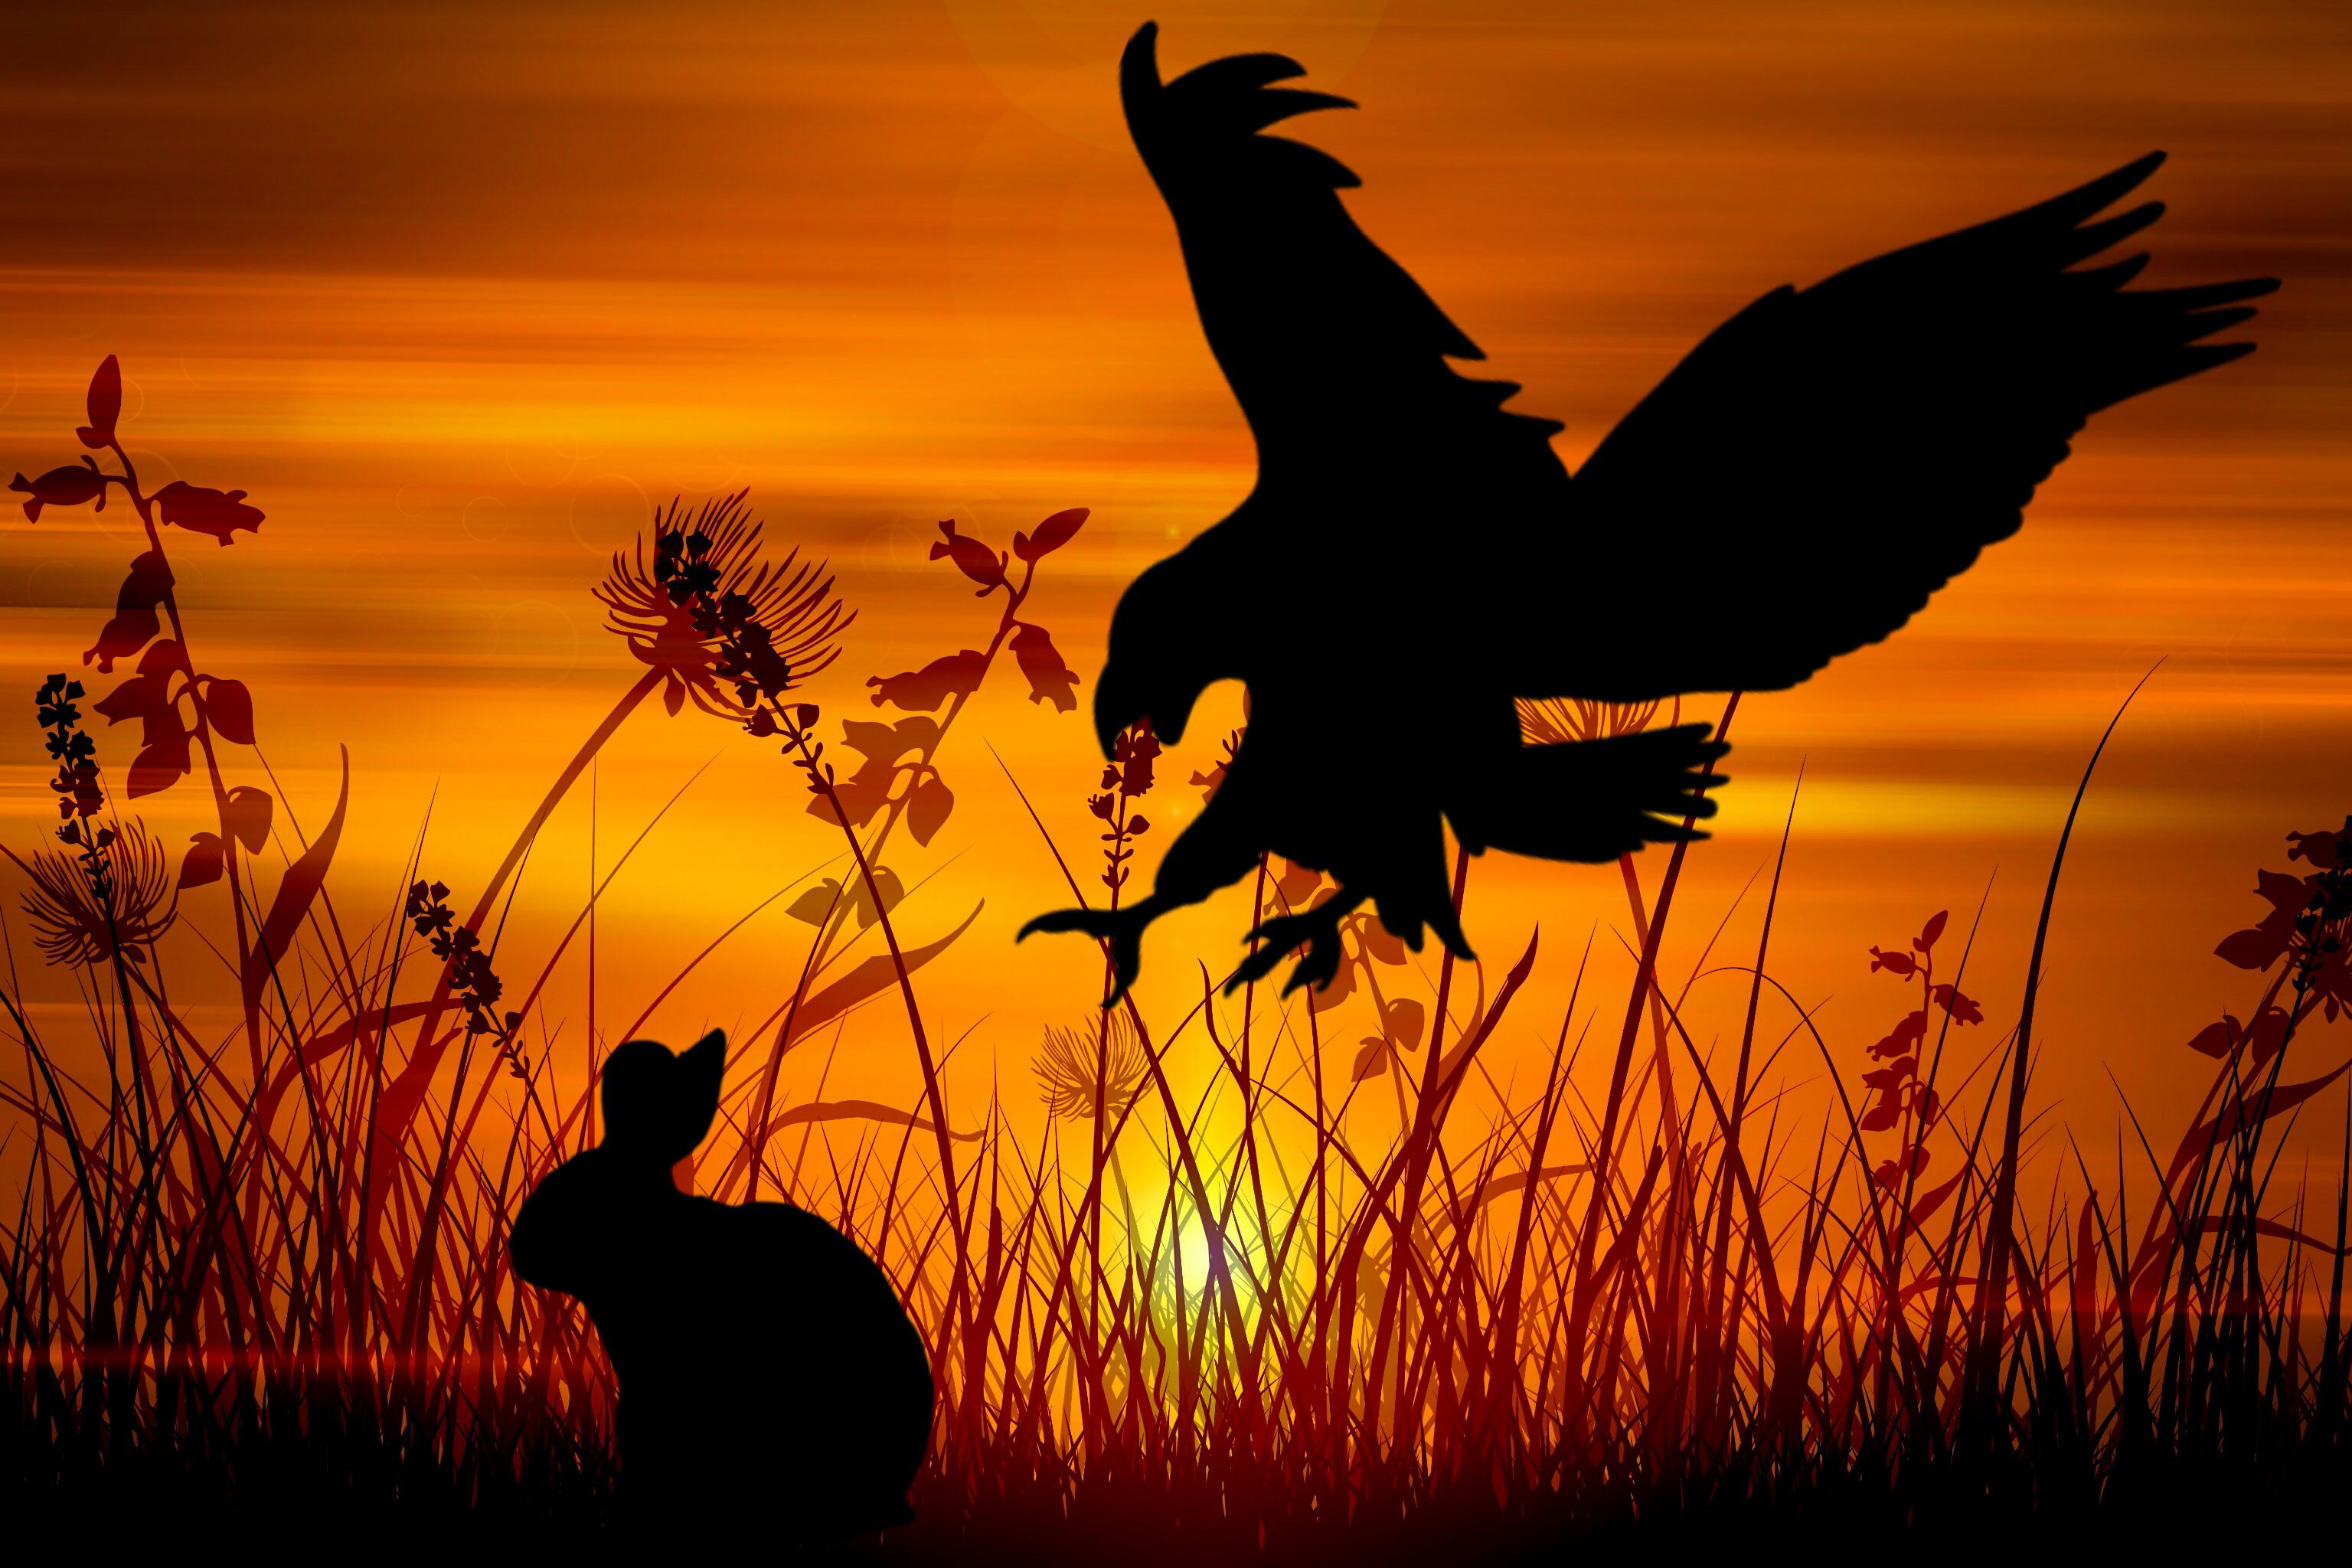 Free Images Eagle Rabbit Hunt Wildlife Hunting Hunter Creature Bunny Sunset Grass Halme Sun Wall Structure Design Orange Ornament Sky Sunrise Silhouette Bird Ecoregion Savanna Beak Evening Computer Wallpaper Dawn Stock